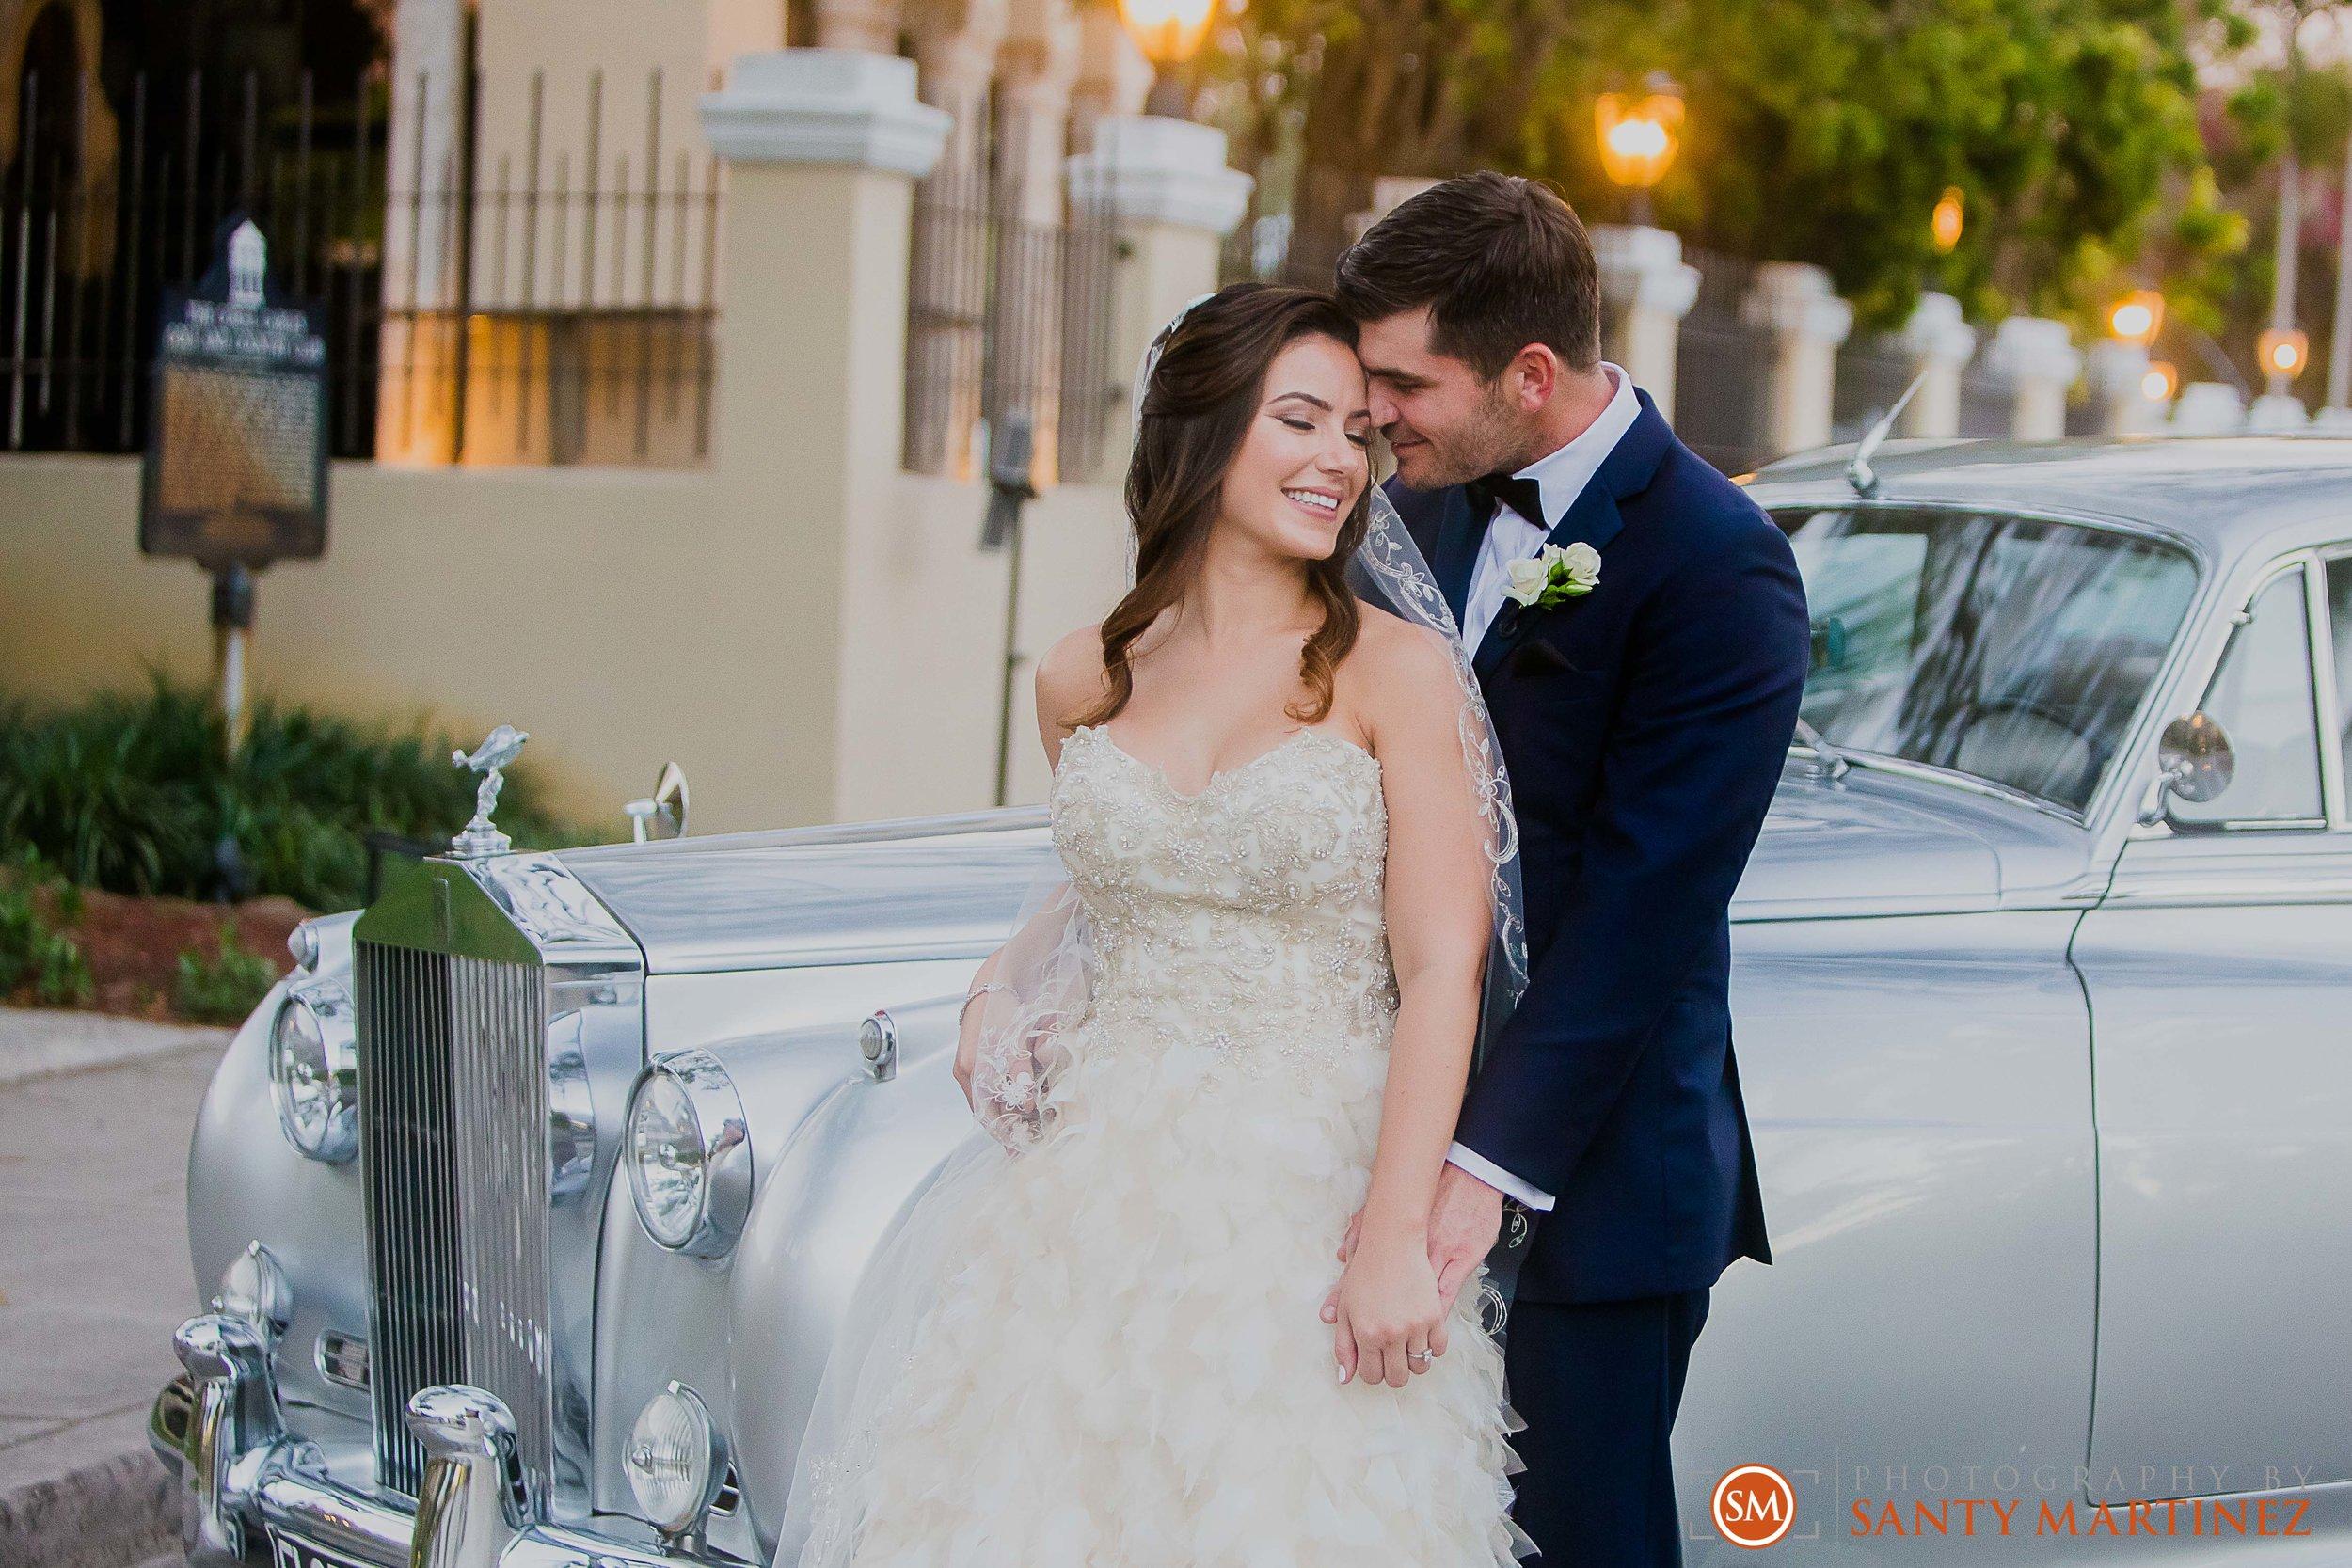 Wedding Coral Gables Country Club - Santy Martinez Photography-21.jpg